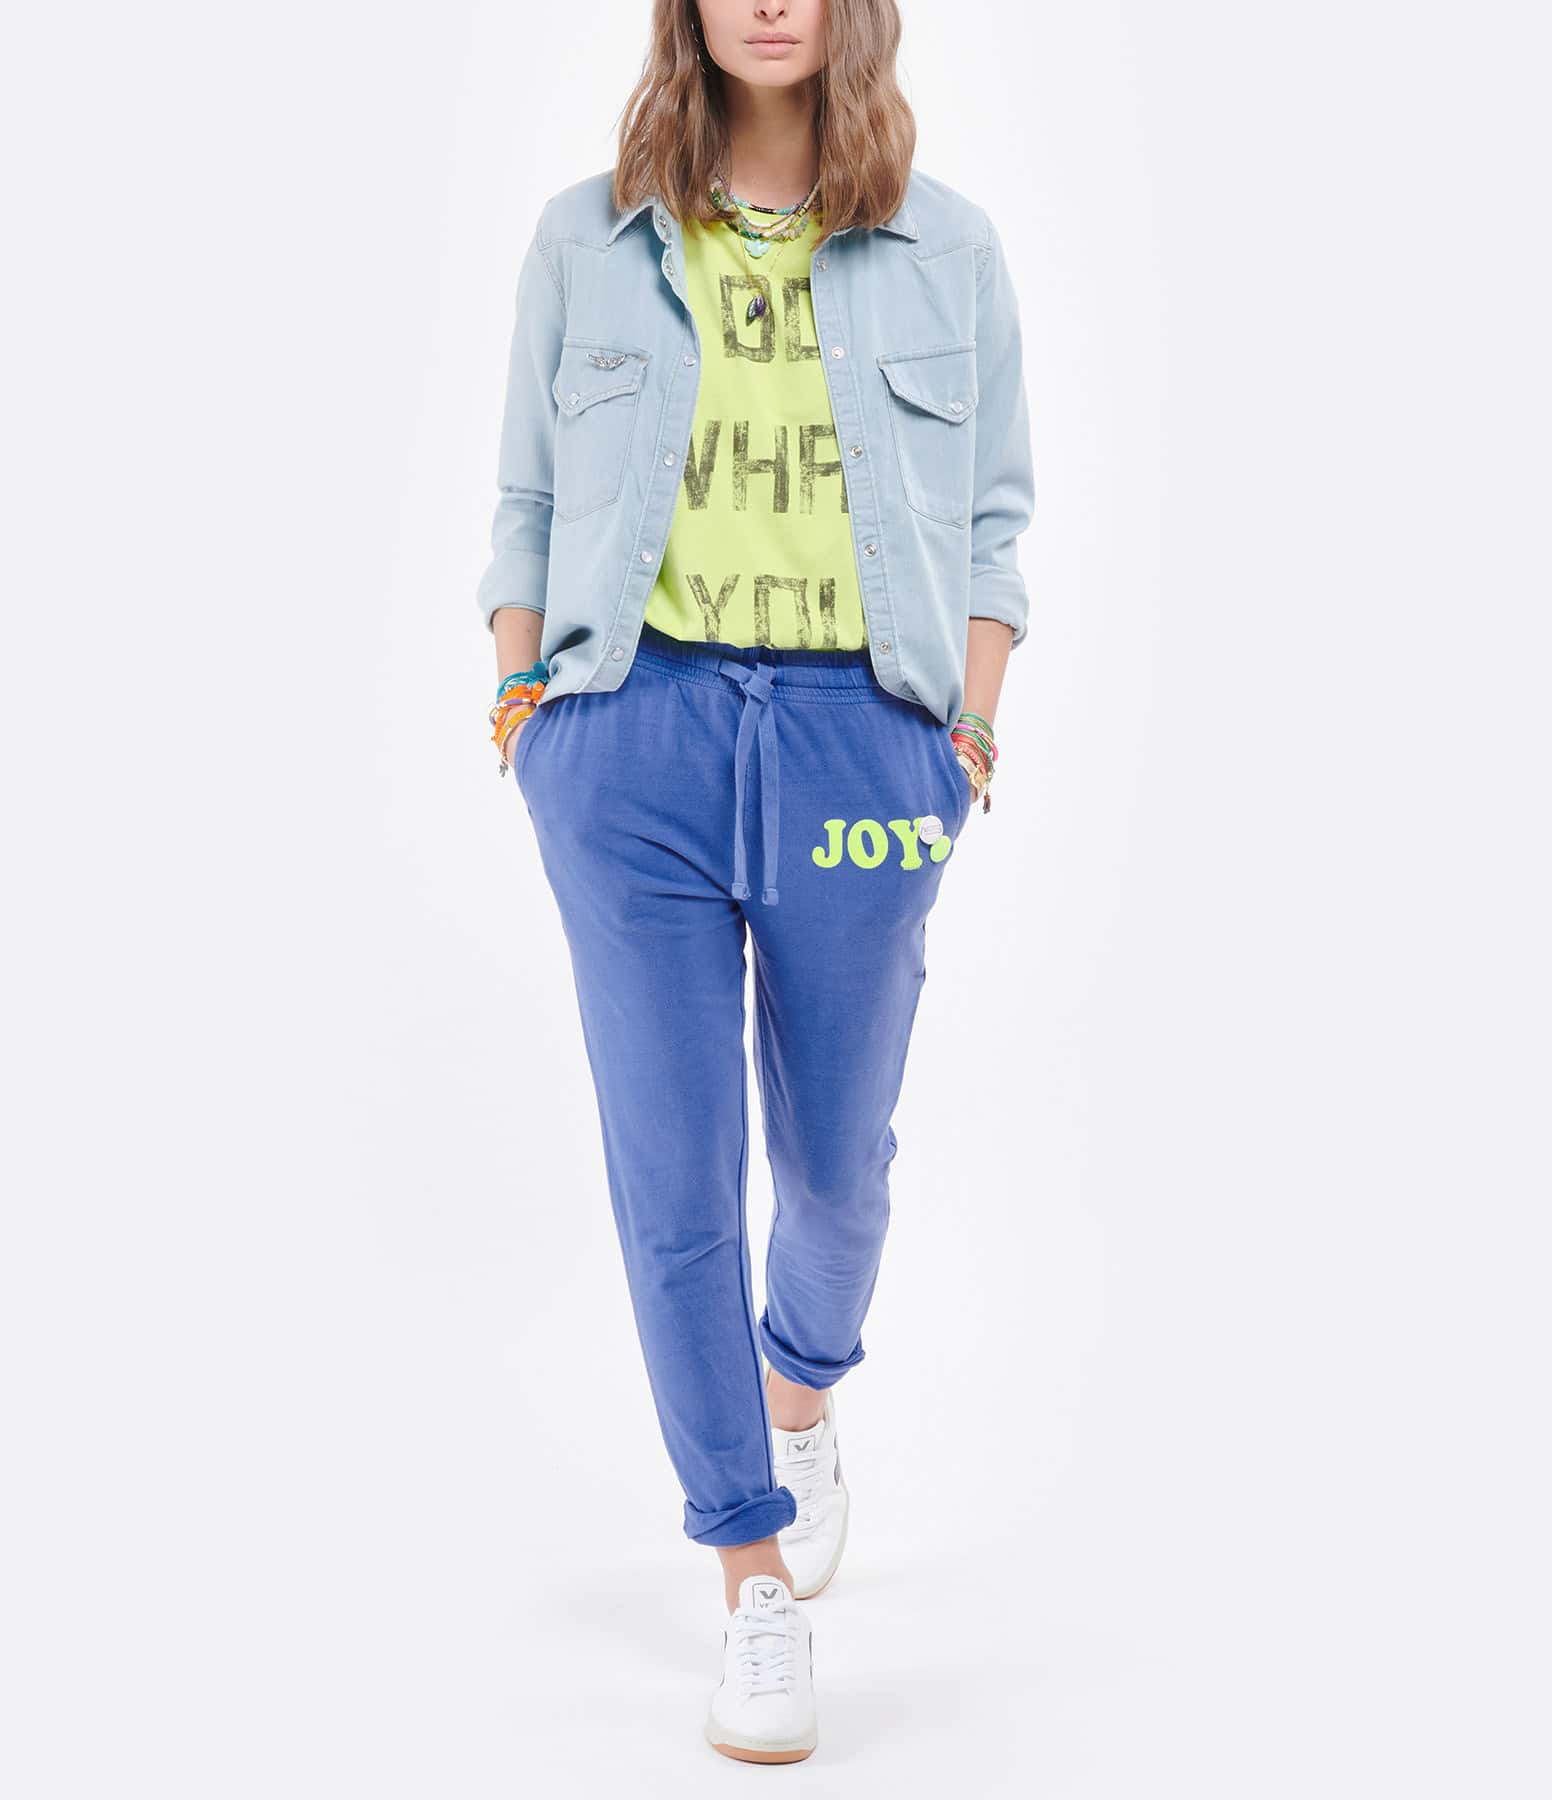 NEWTONE - Jogging Joy Coton Flo Bleu